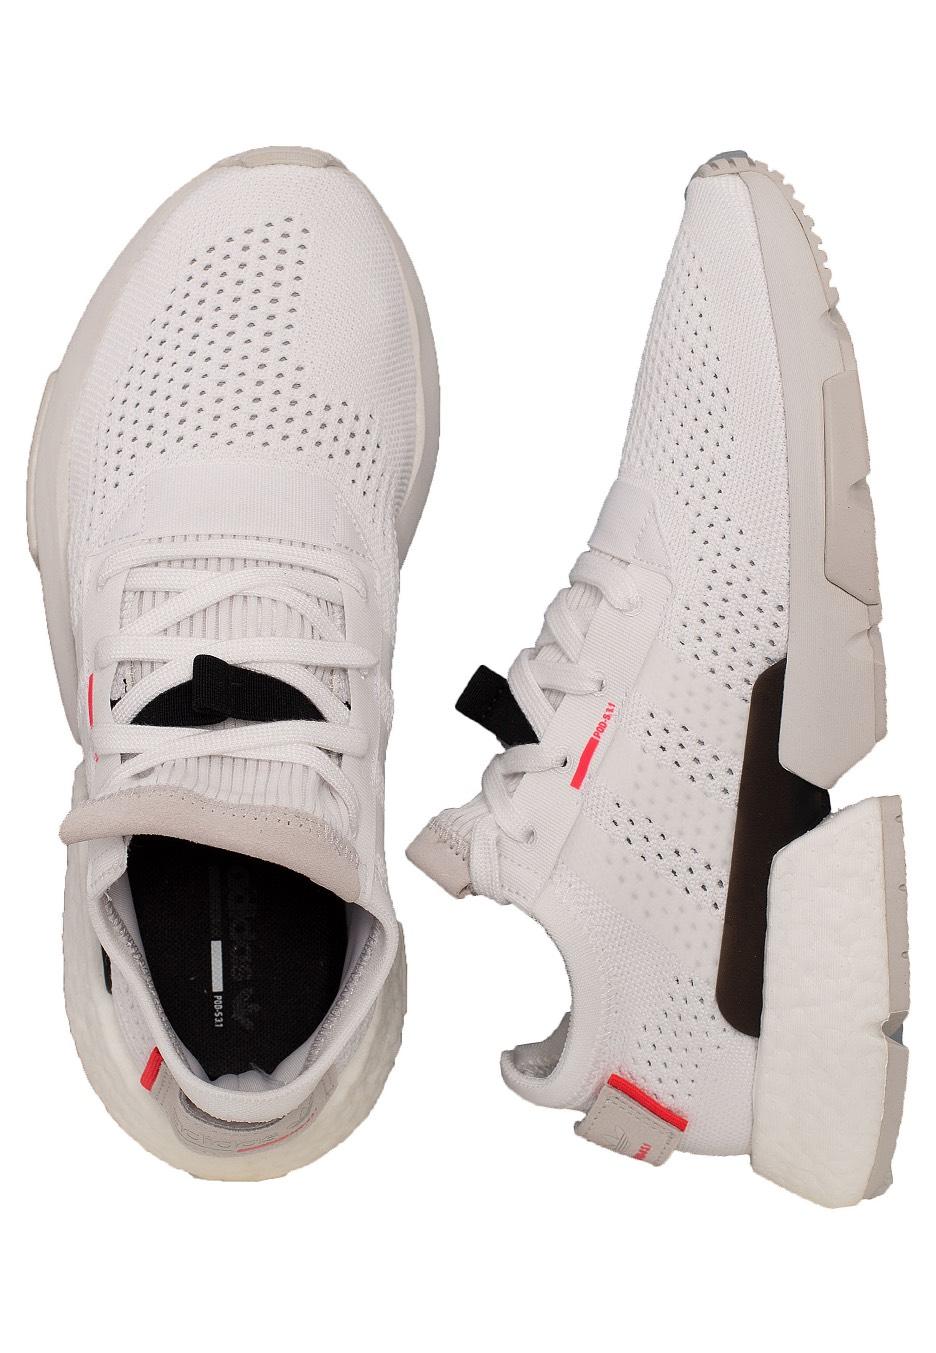 Adidas POD S3.1 Ftwr WhiteFtwr WhiteRed Shoes